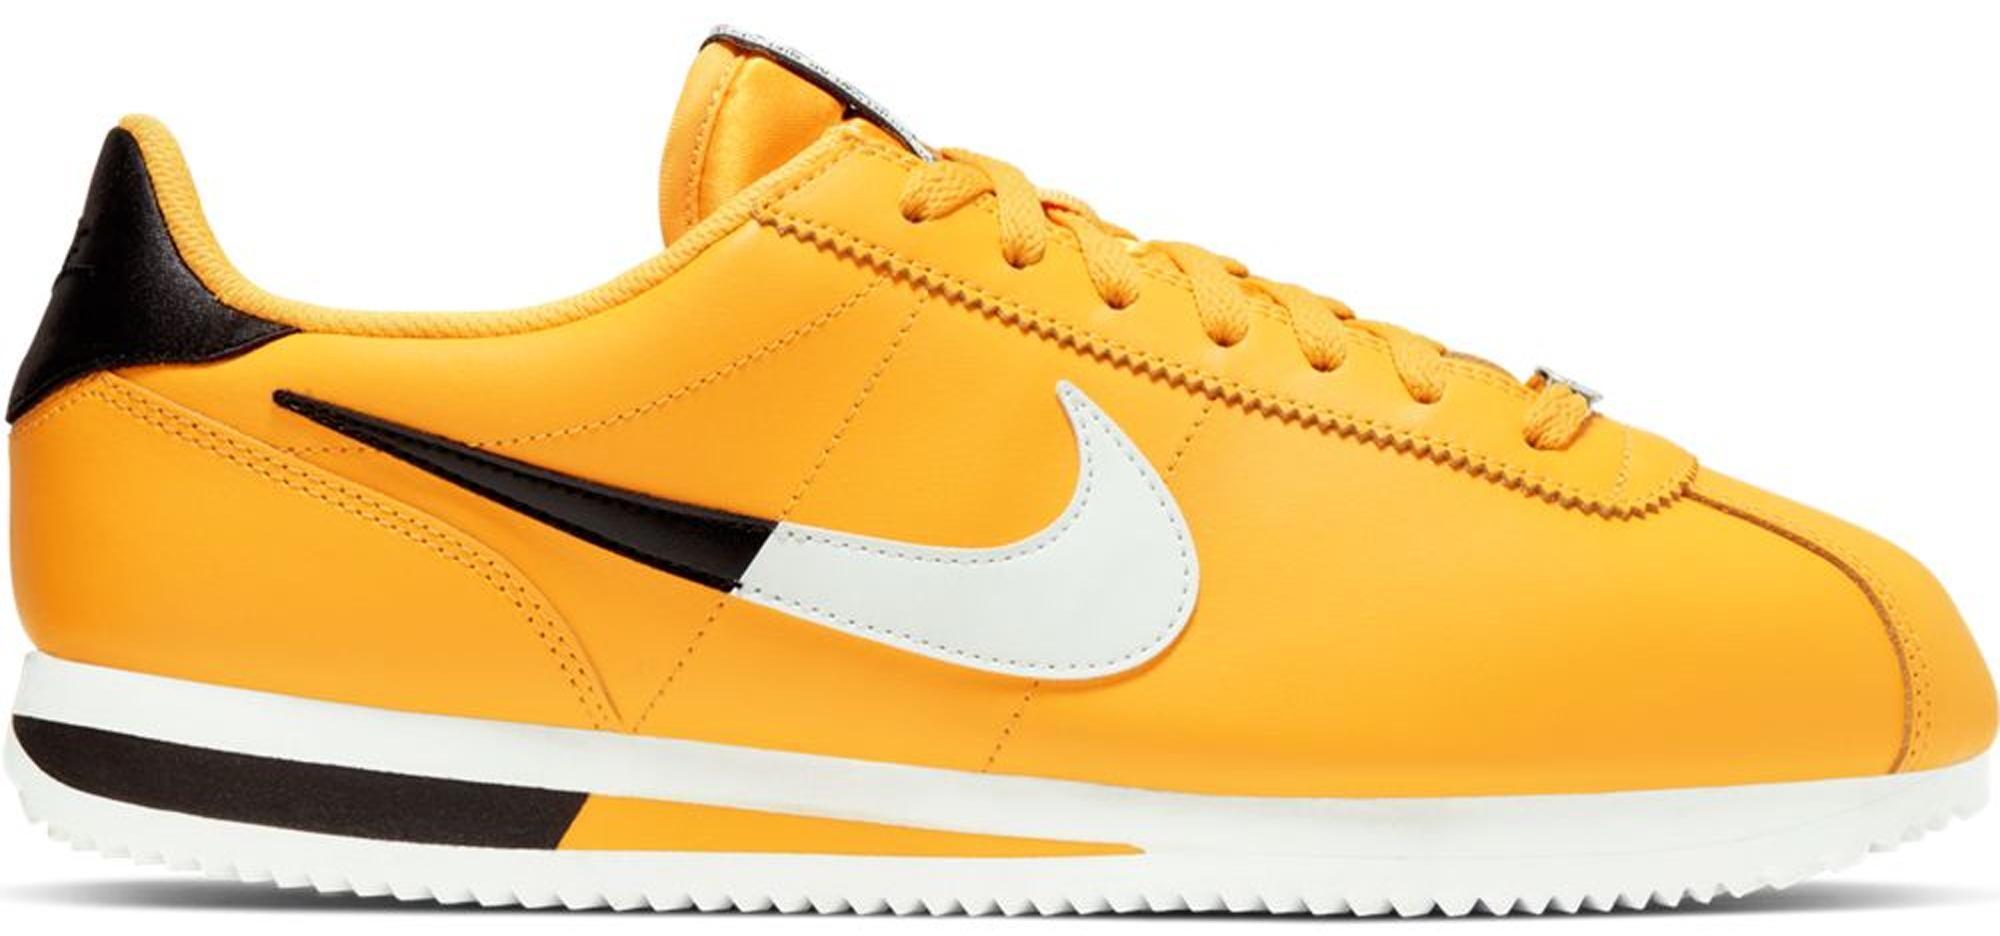 Nike Nba X Cortez Basic Leather Se in